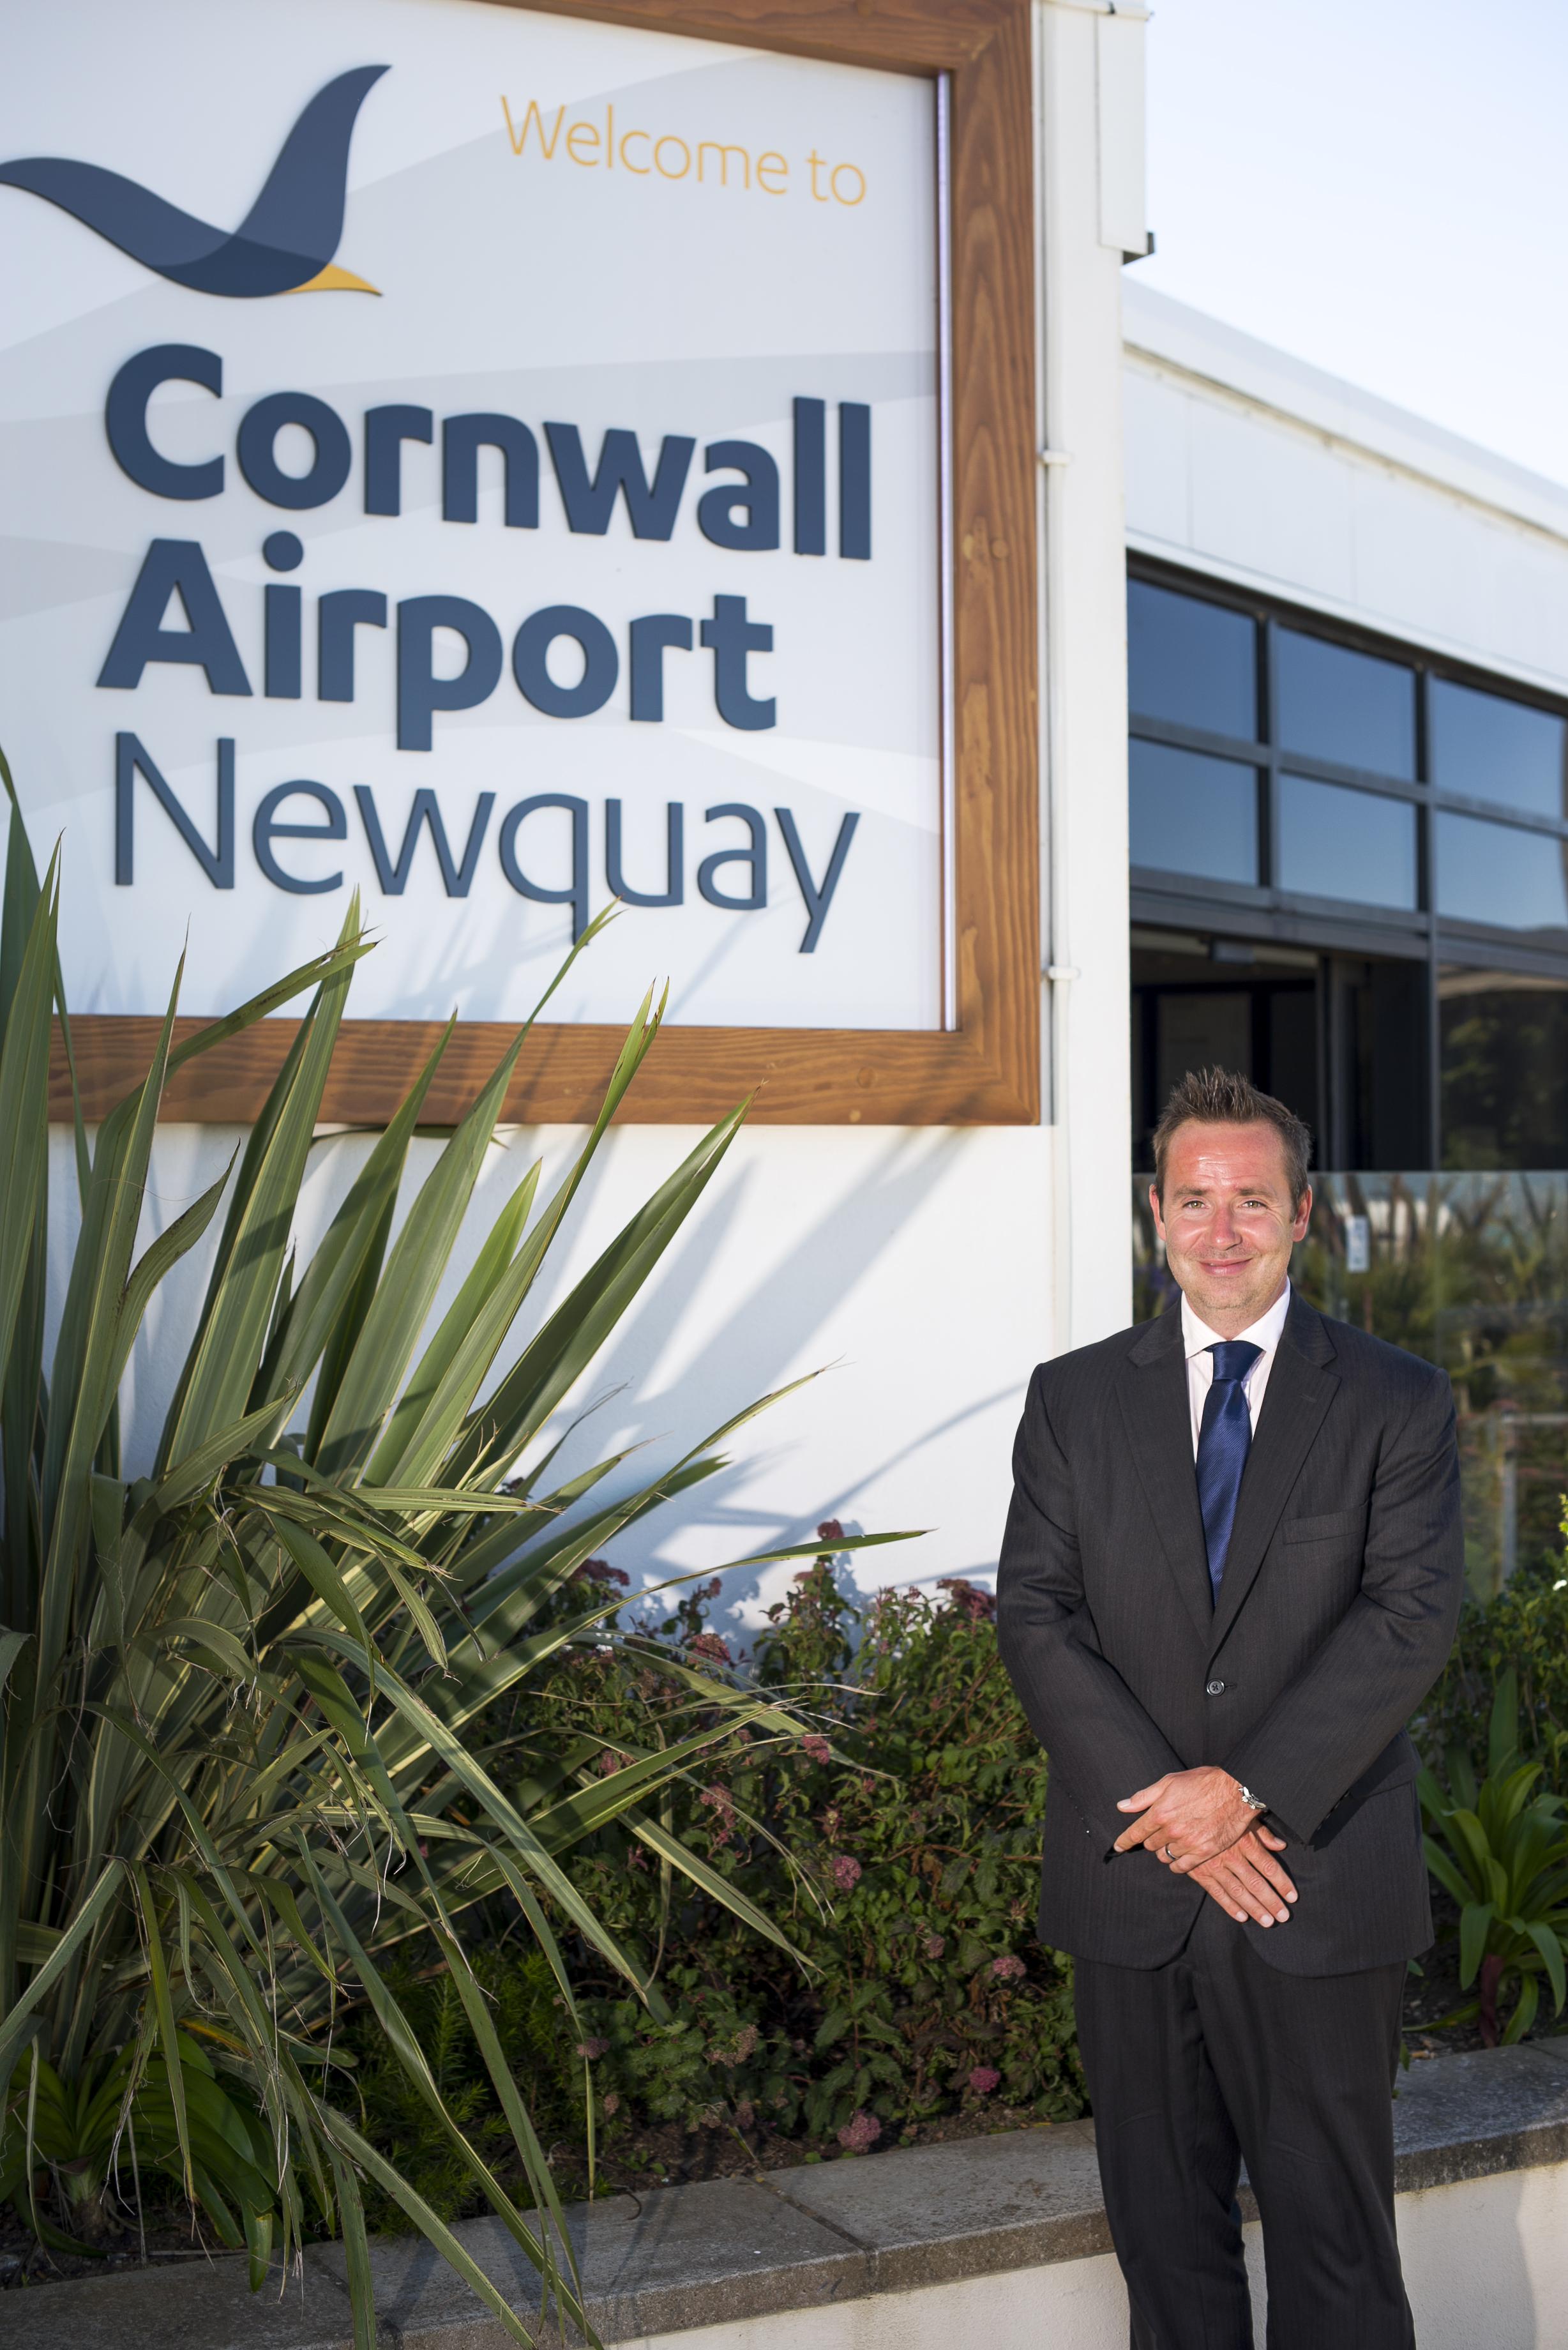 Cornwall-Airport-Newquay-Al-Titterington-MD